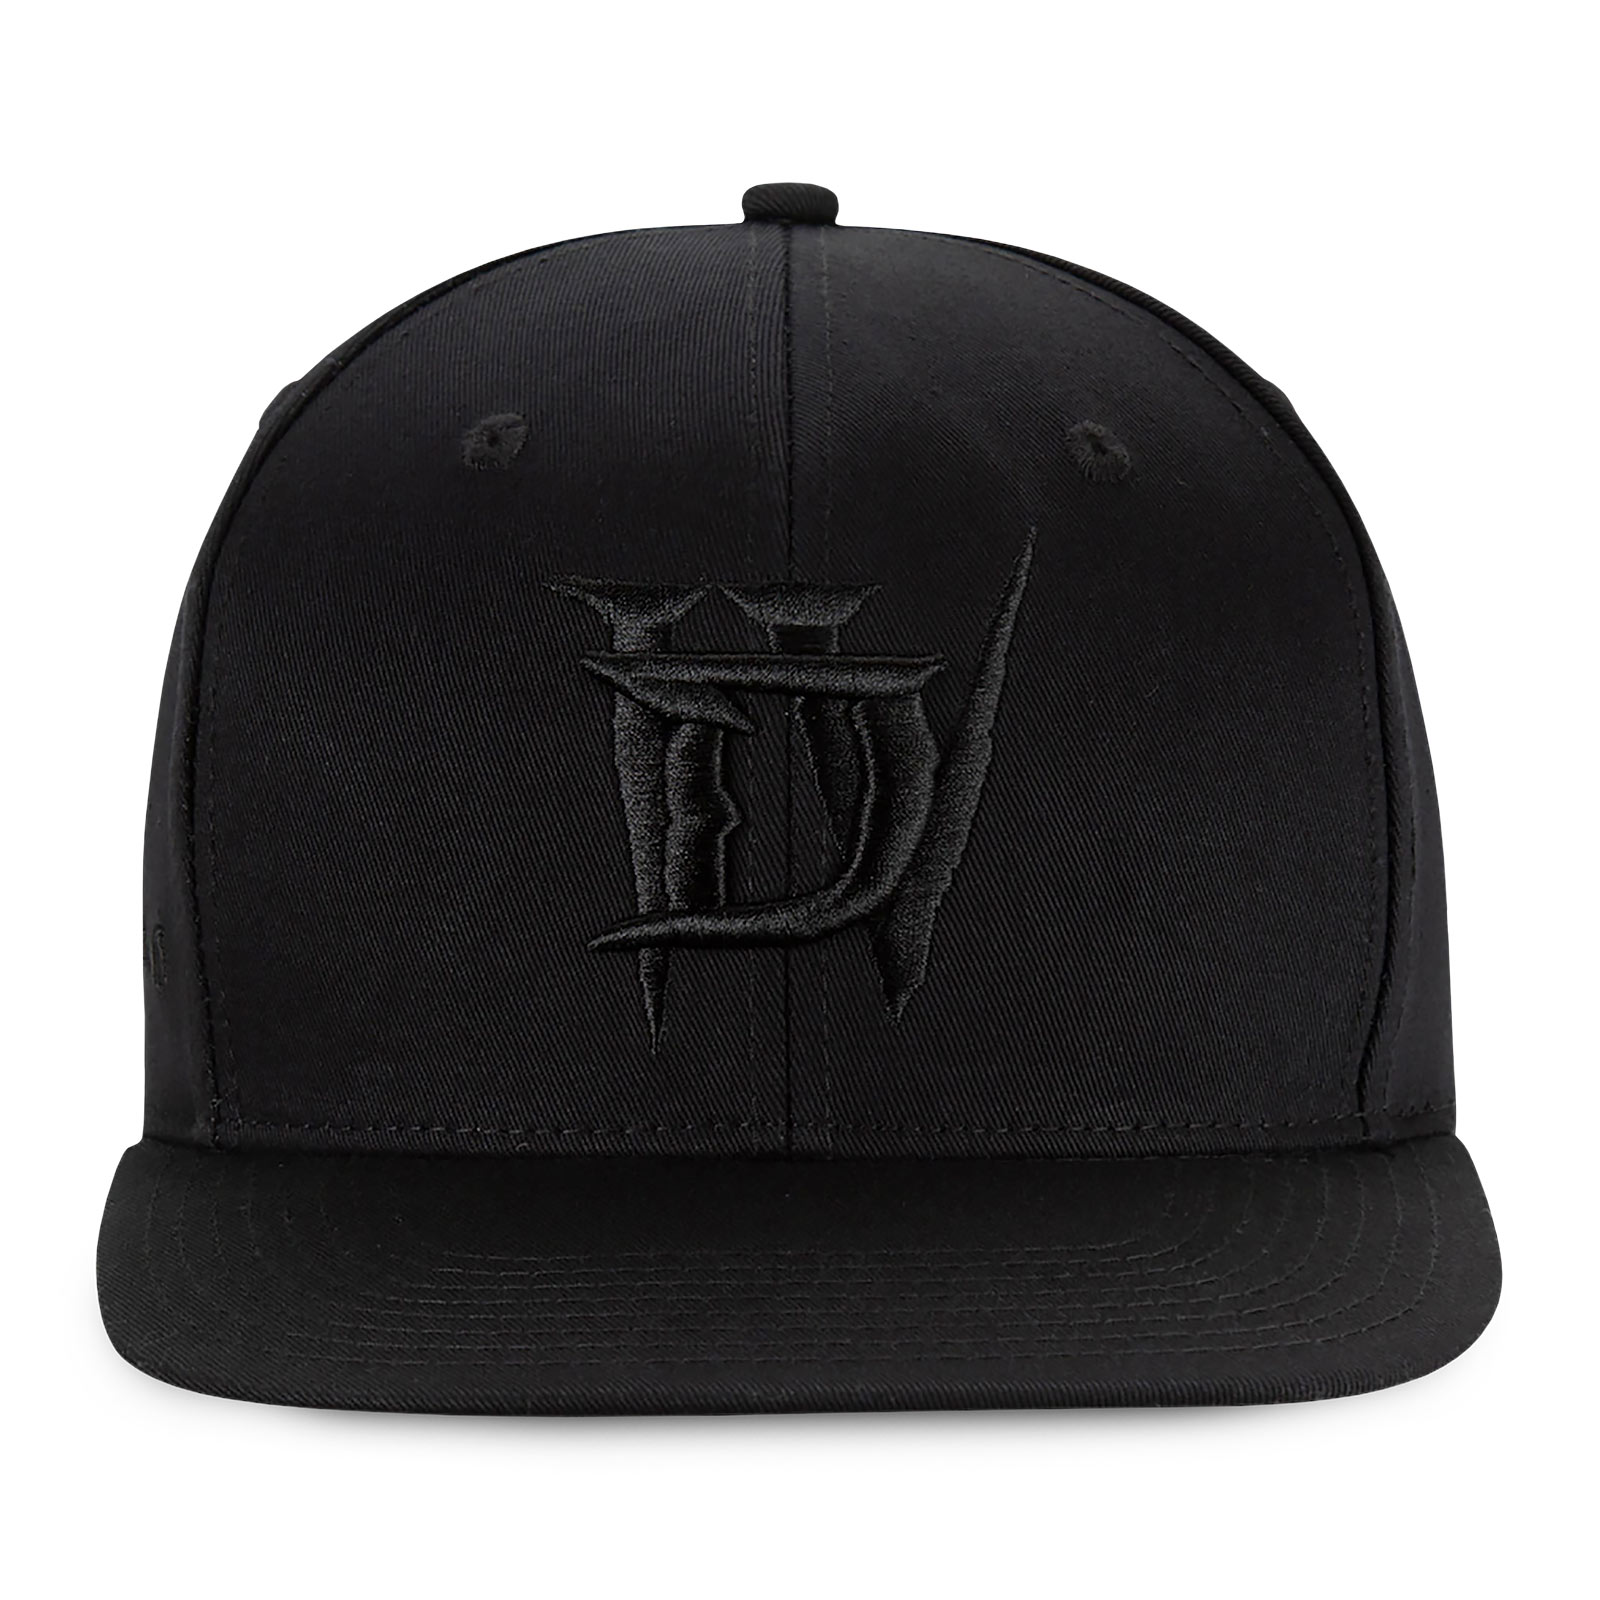 Diablo IV - Blackout Snapback Cap schwarz